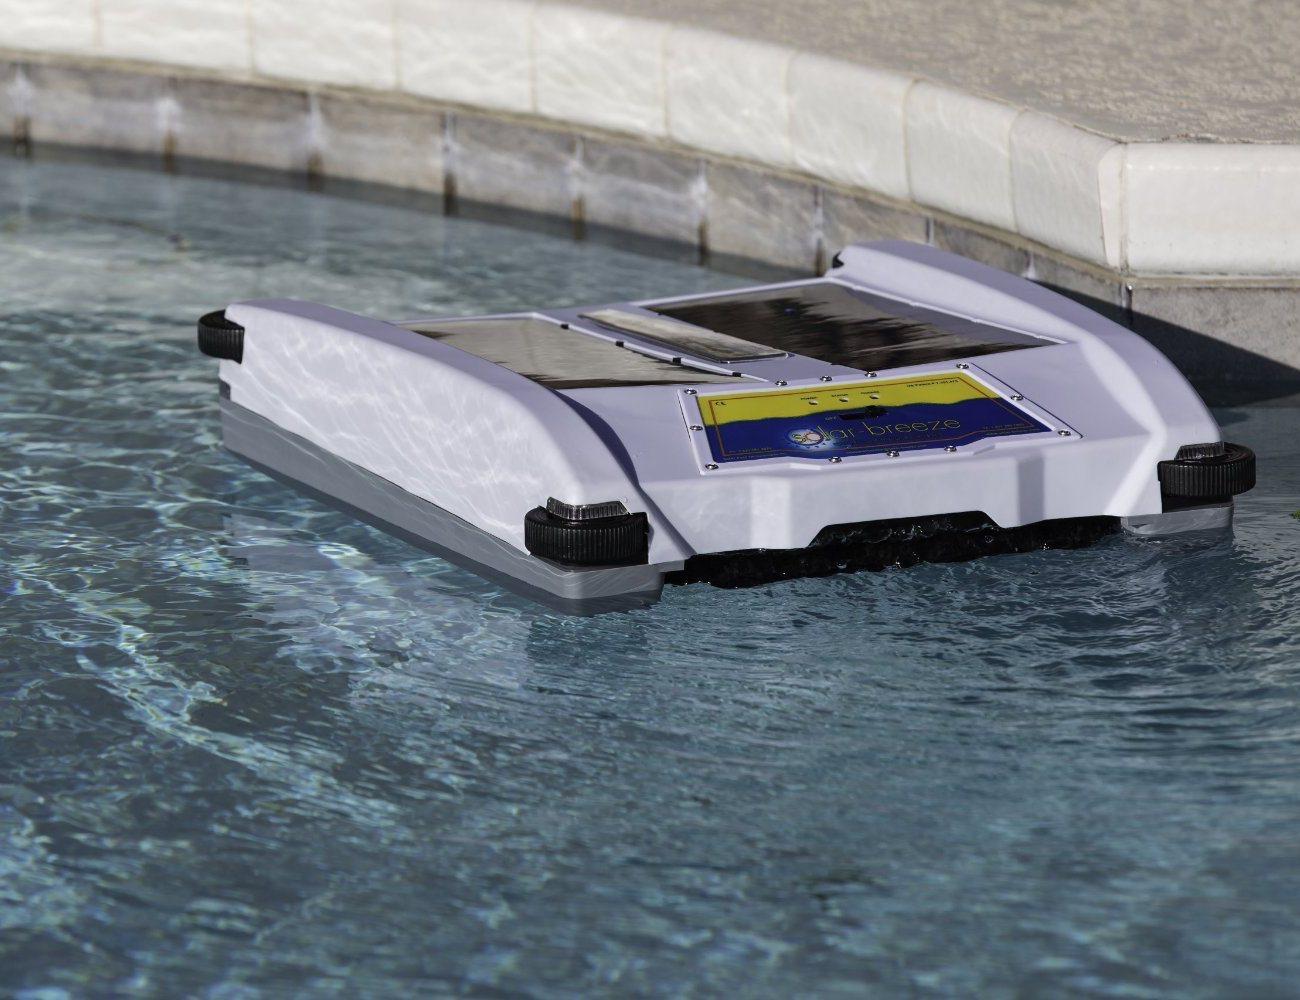 Robotic Solar Pool Skimmer